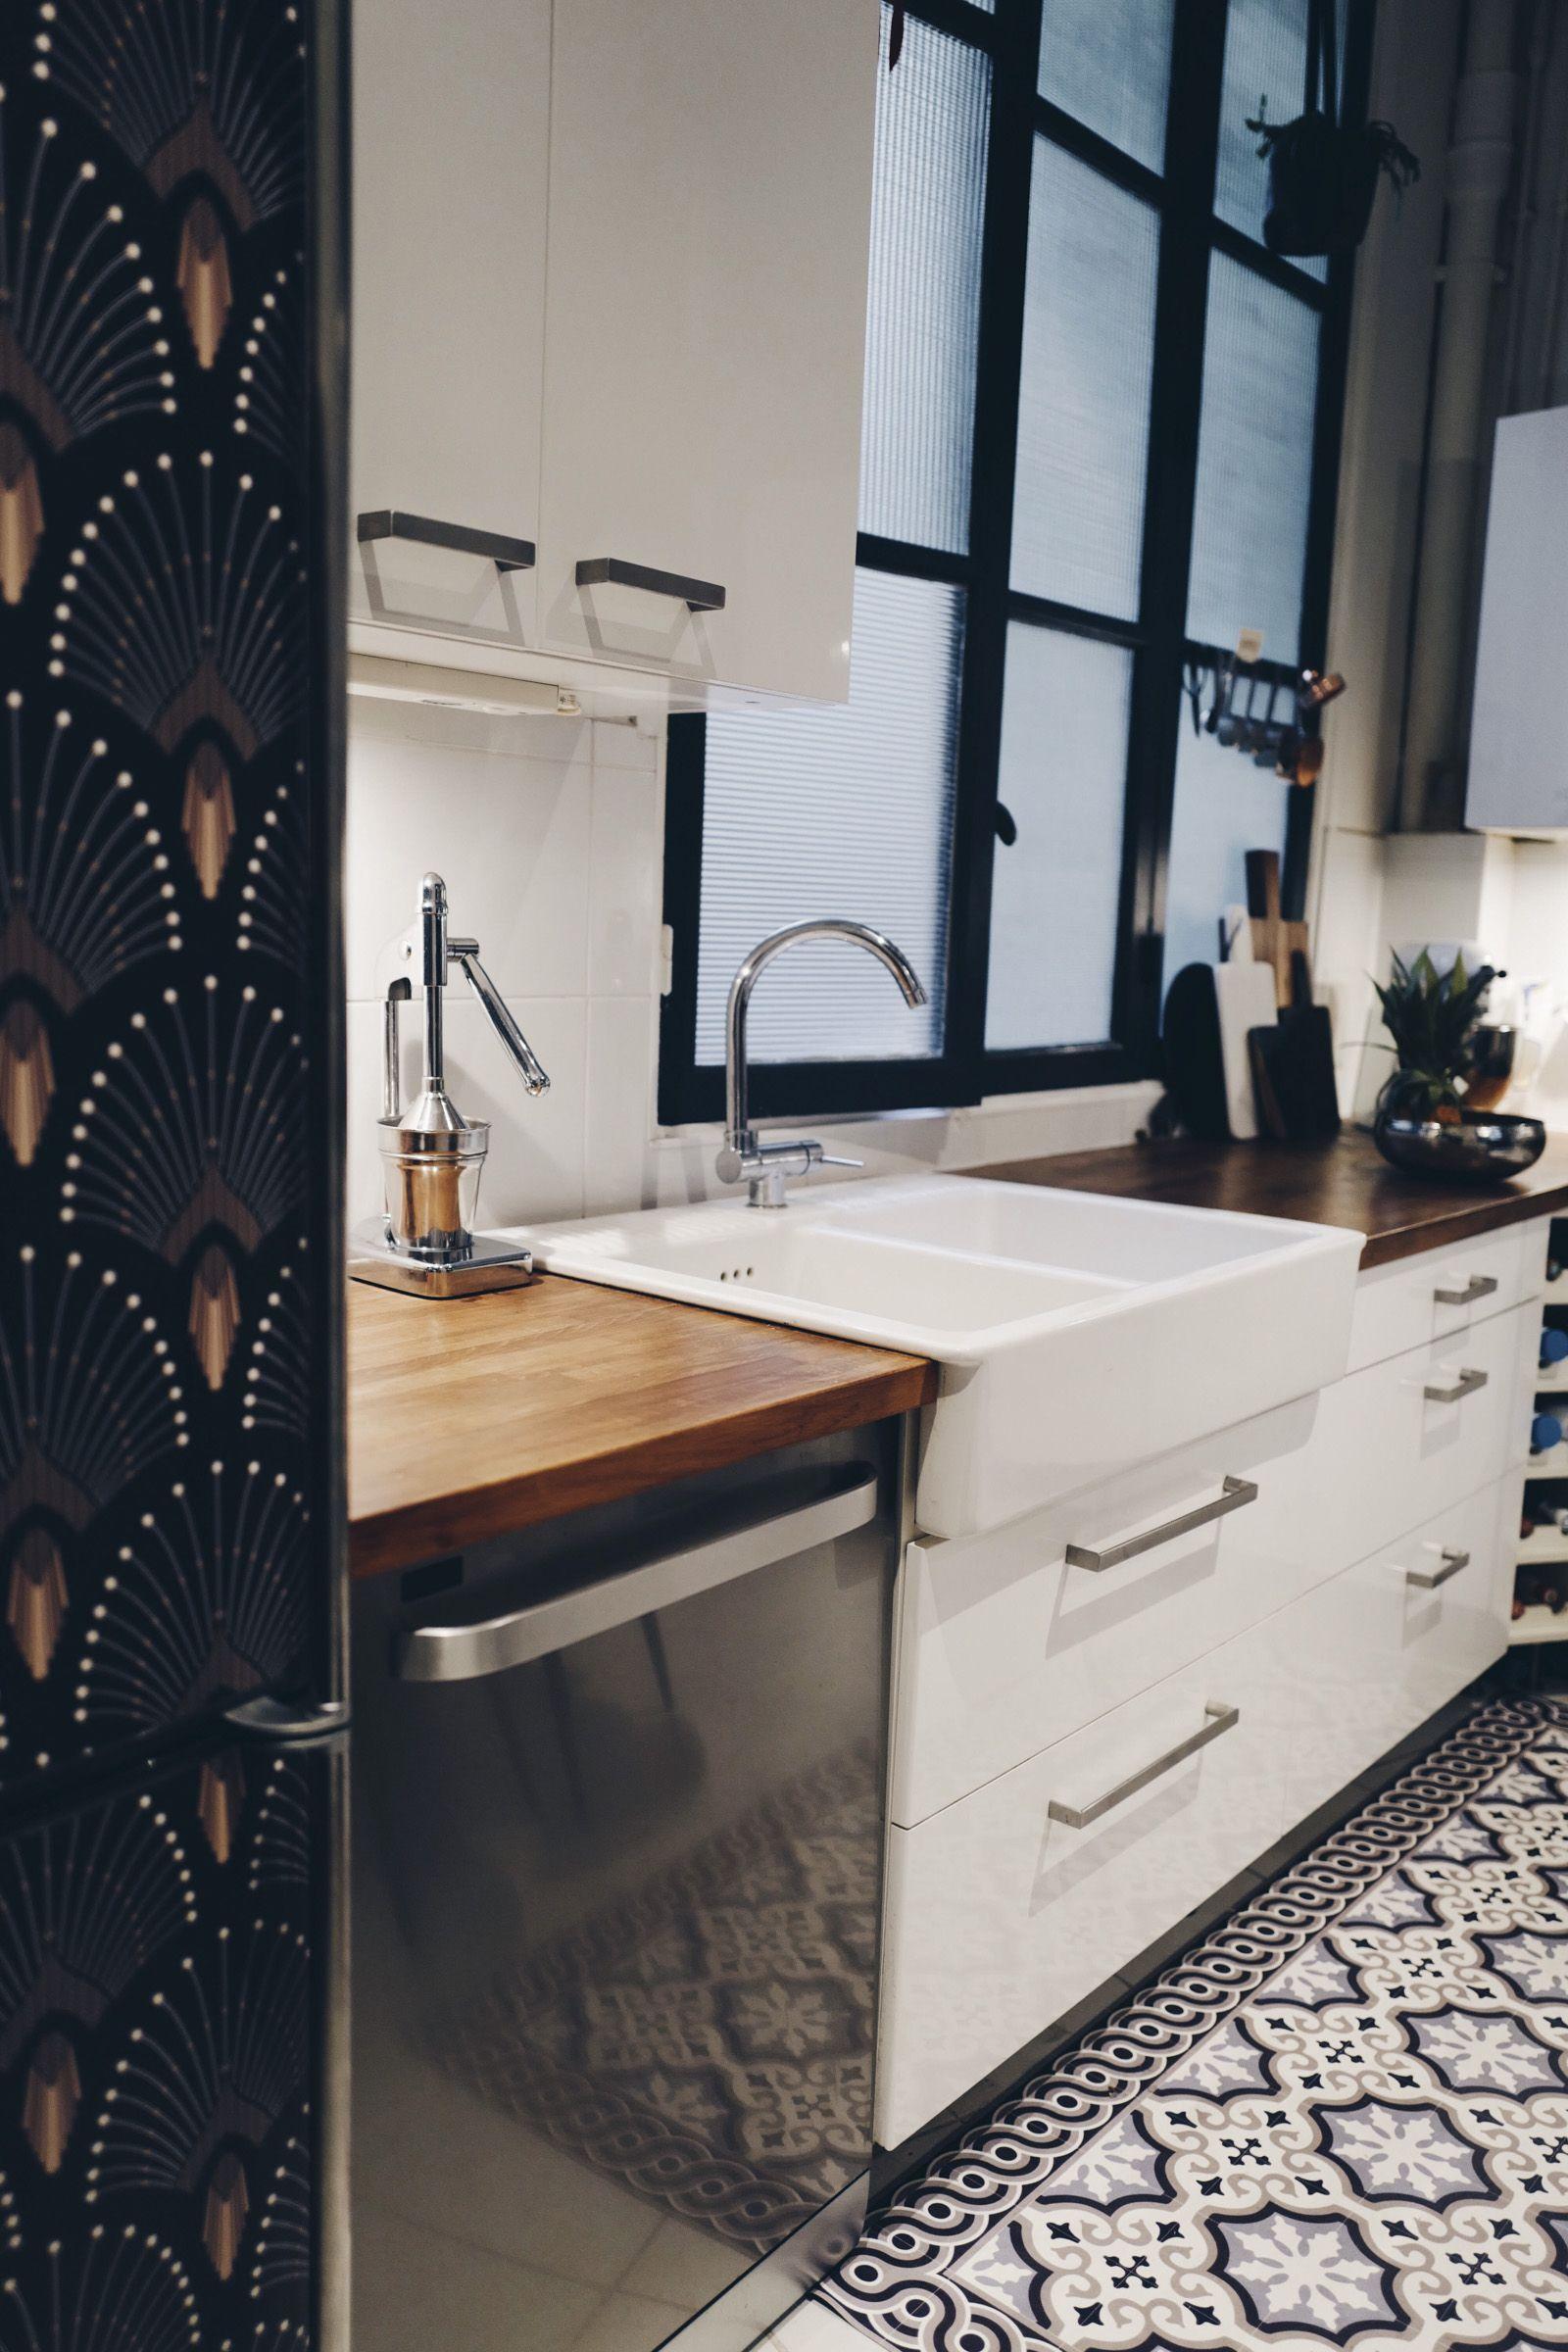 coup de frais at home chez moi d coration frigo. Black Bedroom Furniture Sets. Home Design Ideas